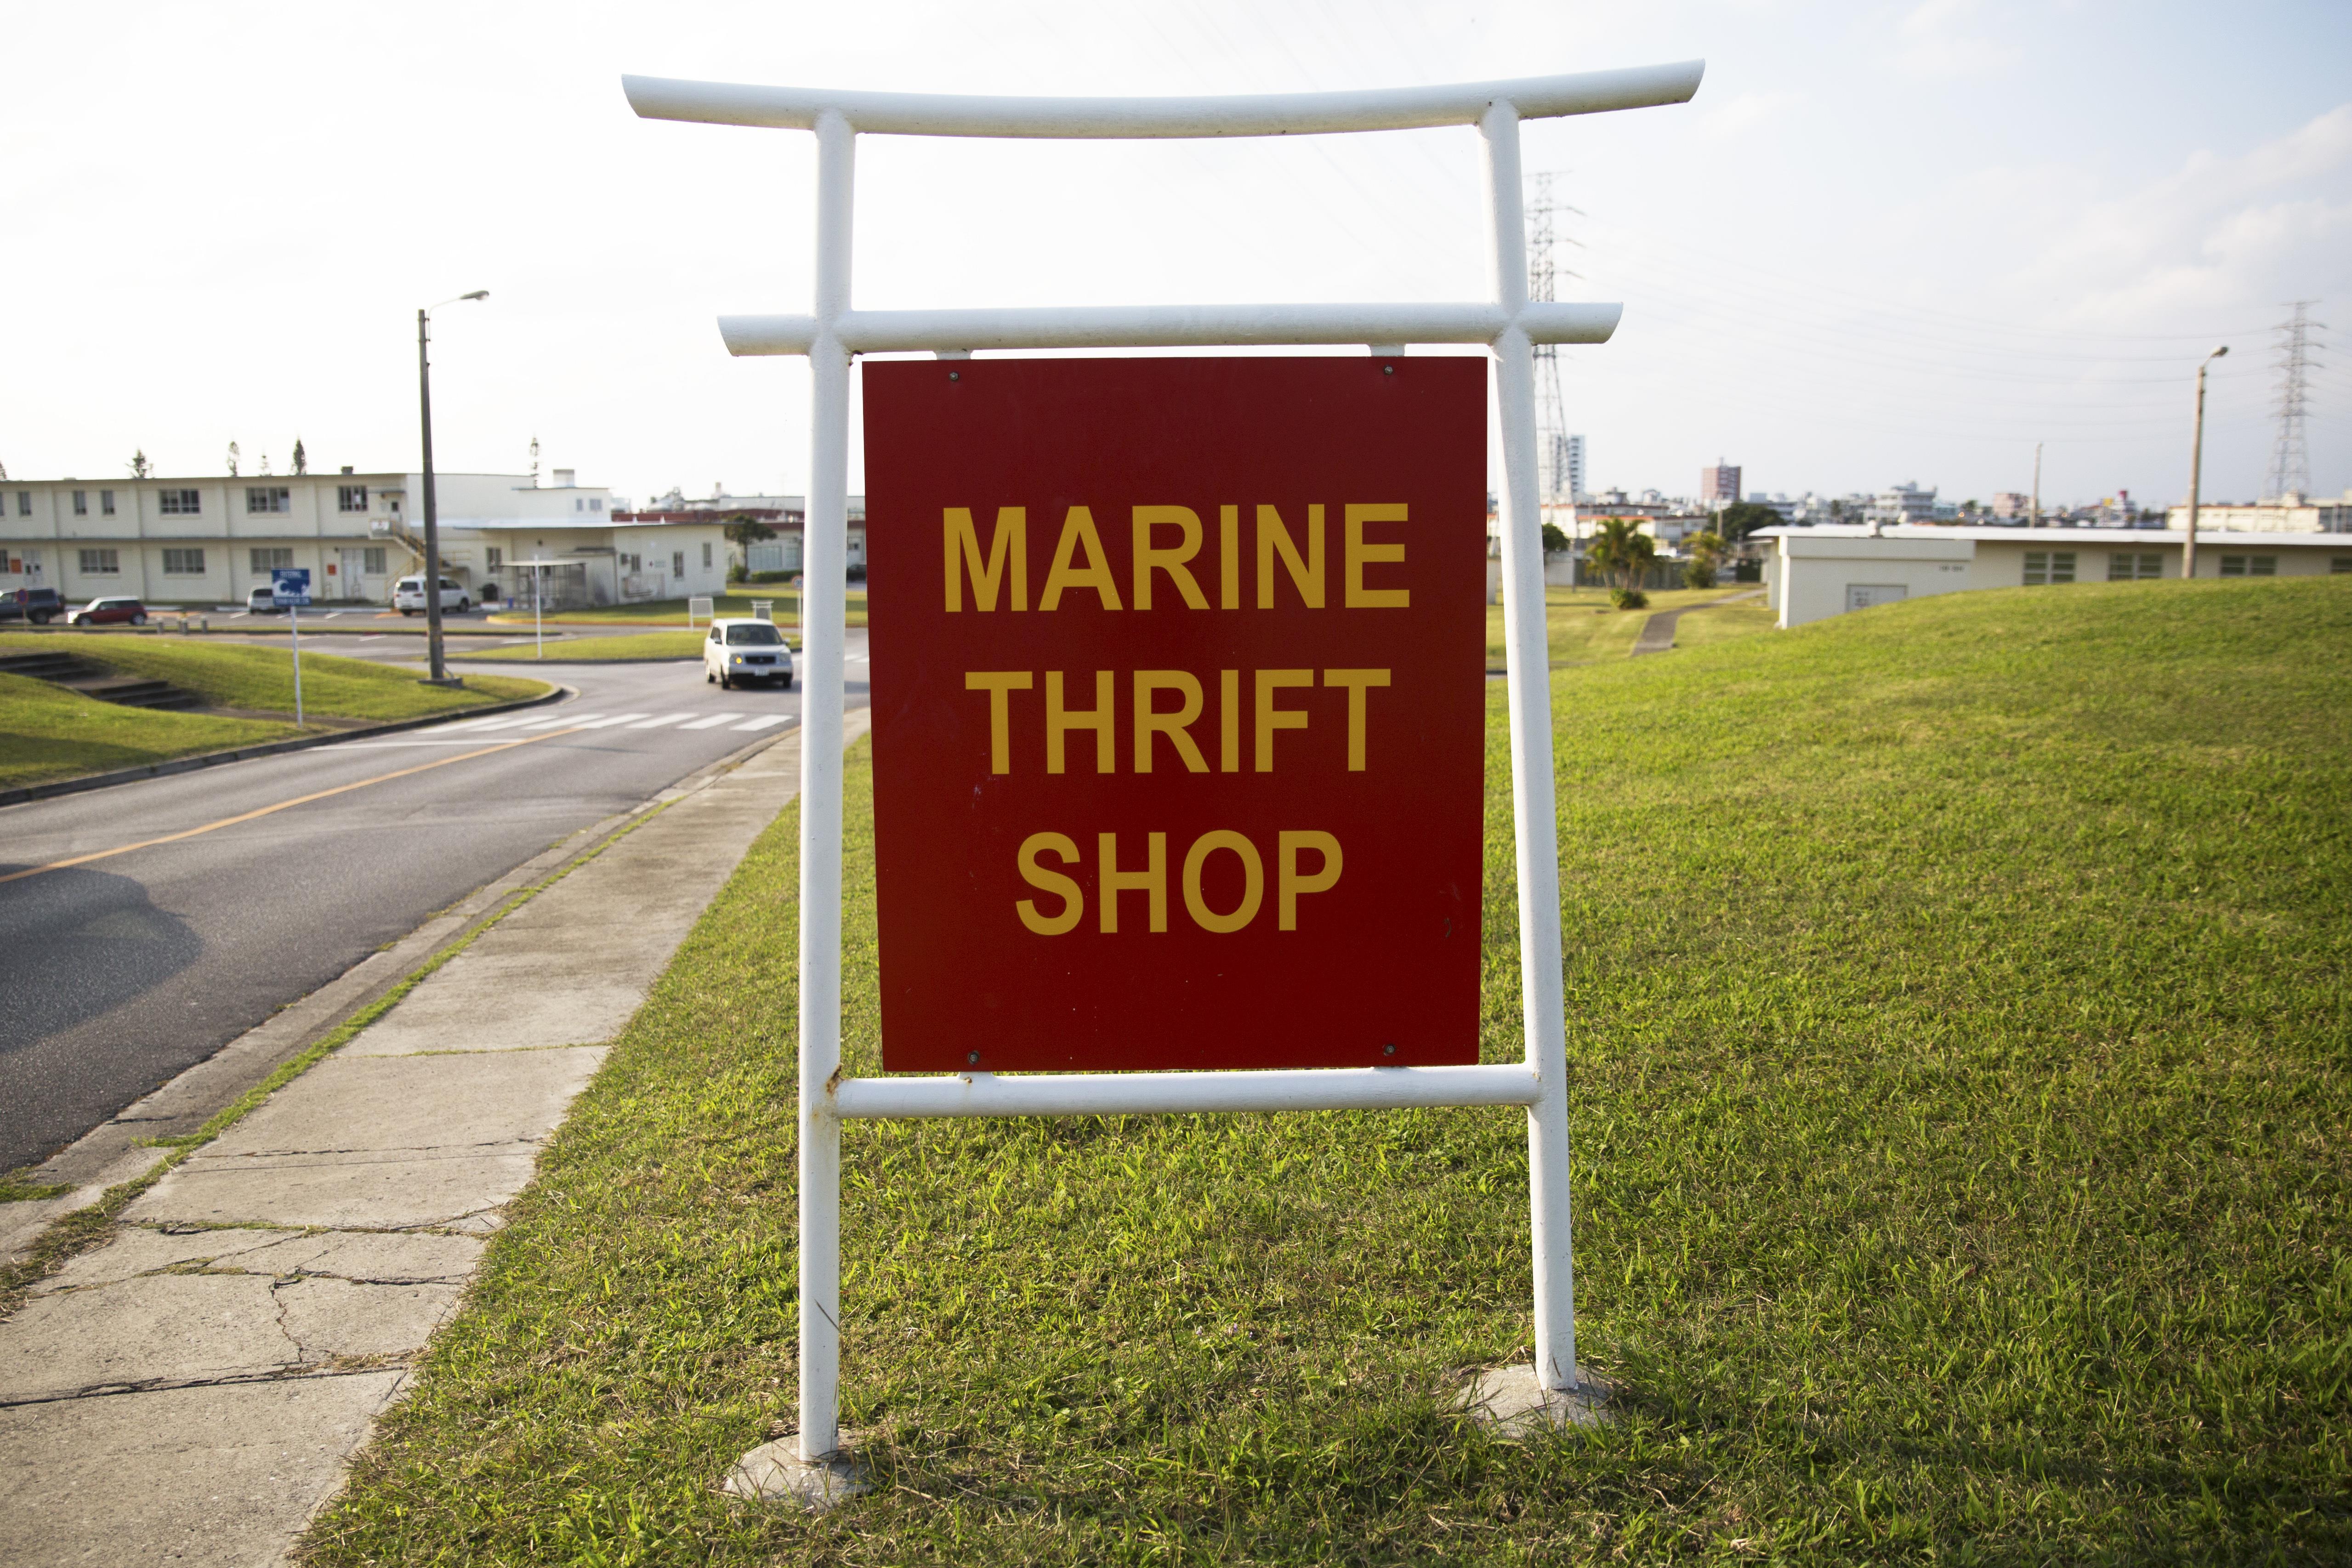 Marine Thrift Shop provides convenient affordable  : 170110 M TA471 048 from www.okinawa.marines.mil size 5118 x 3412 jpeg 2322kB